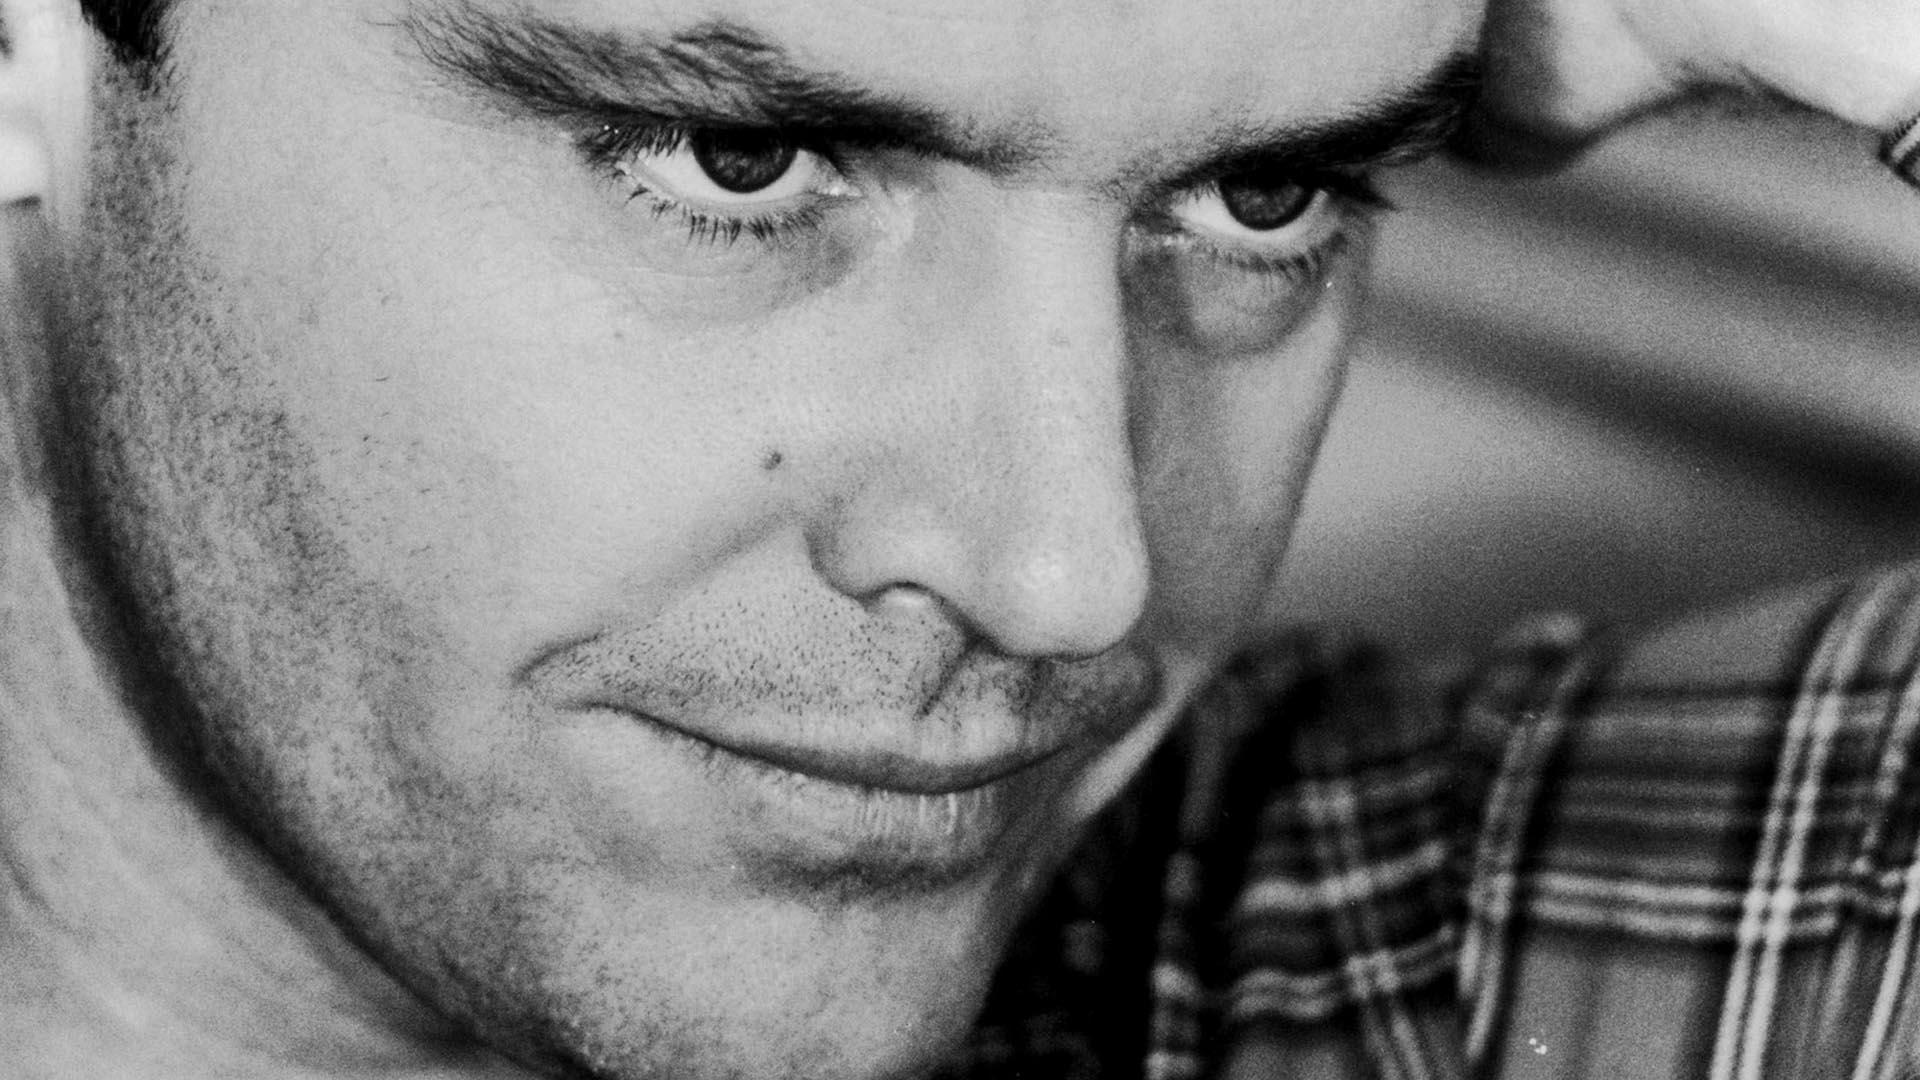 Jack Nicholson HD Wallpapers 1920x1080